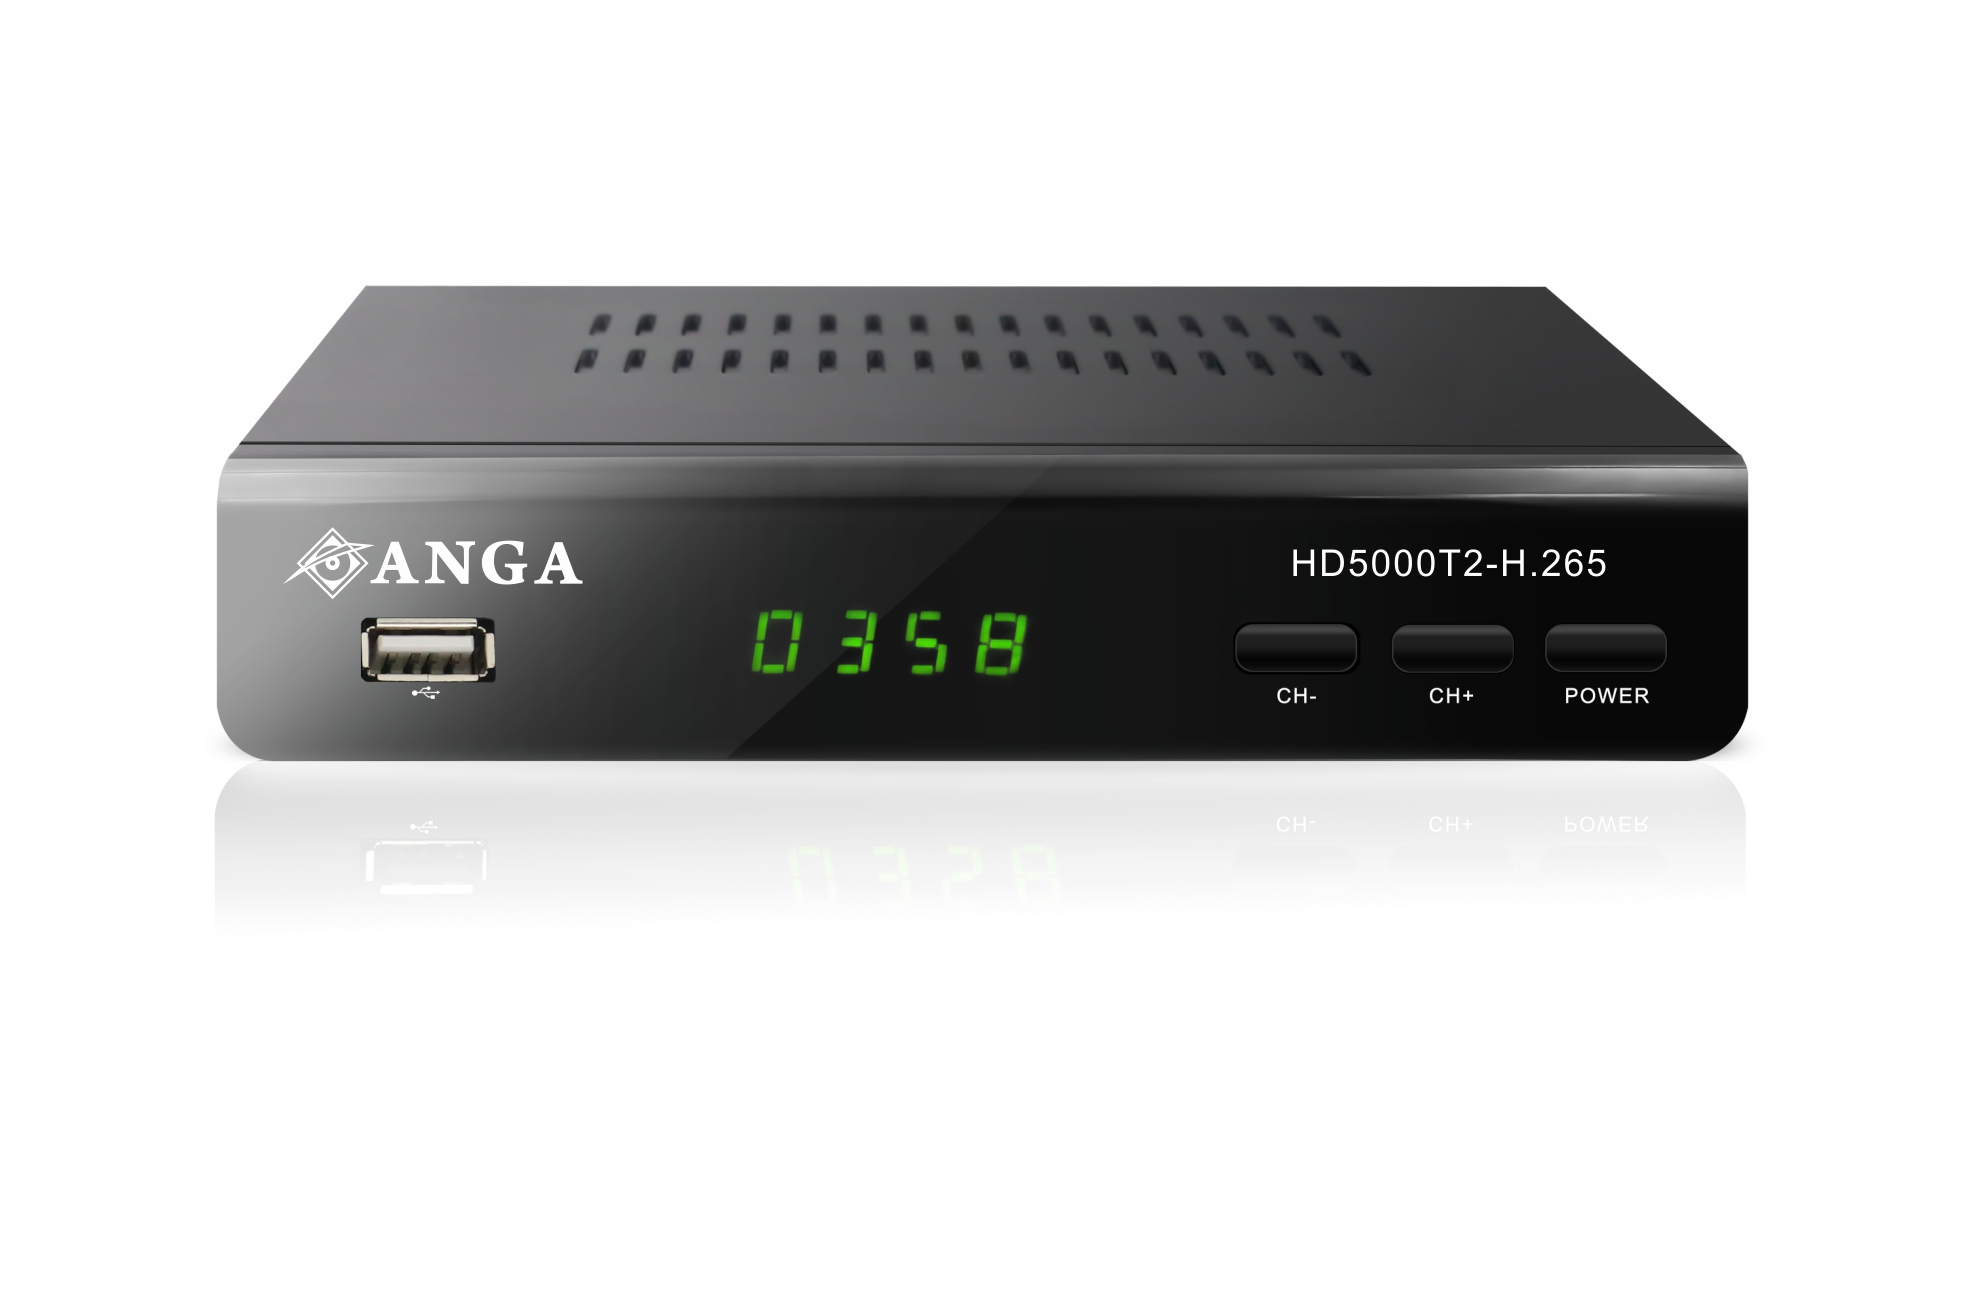 ANGA HD5000T2-H.265 Επίγειος Ψηφιακός Δέκτης